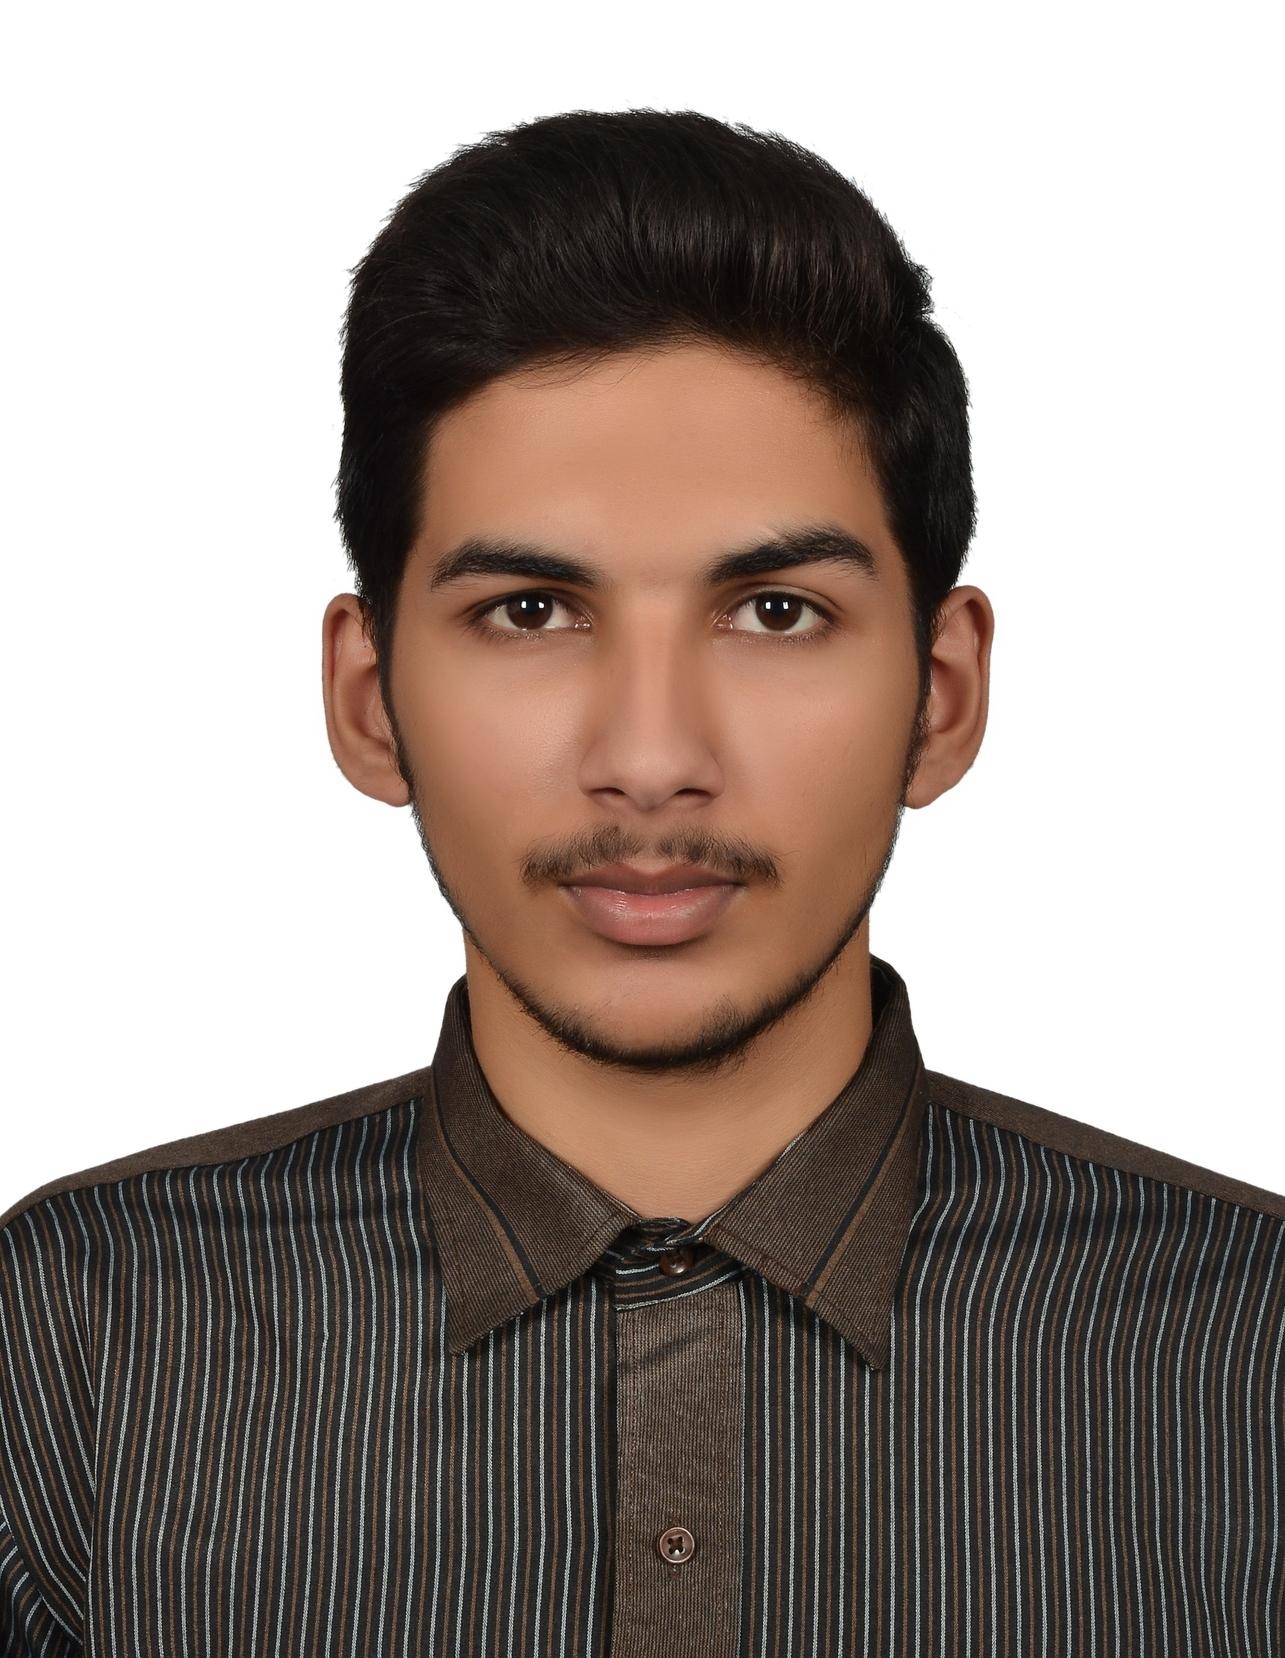 Muhammad Ahtisham Ali Shah Word, Electrical Engineering, Electronics, Microcontroller, Wireless Charging, Google Chrome, Electricians, CCTV, Mobile Repair